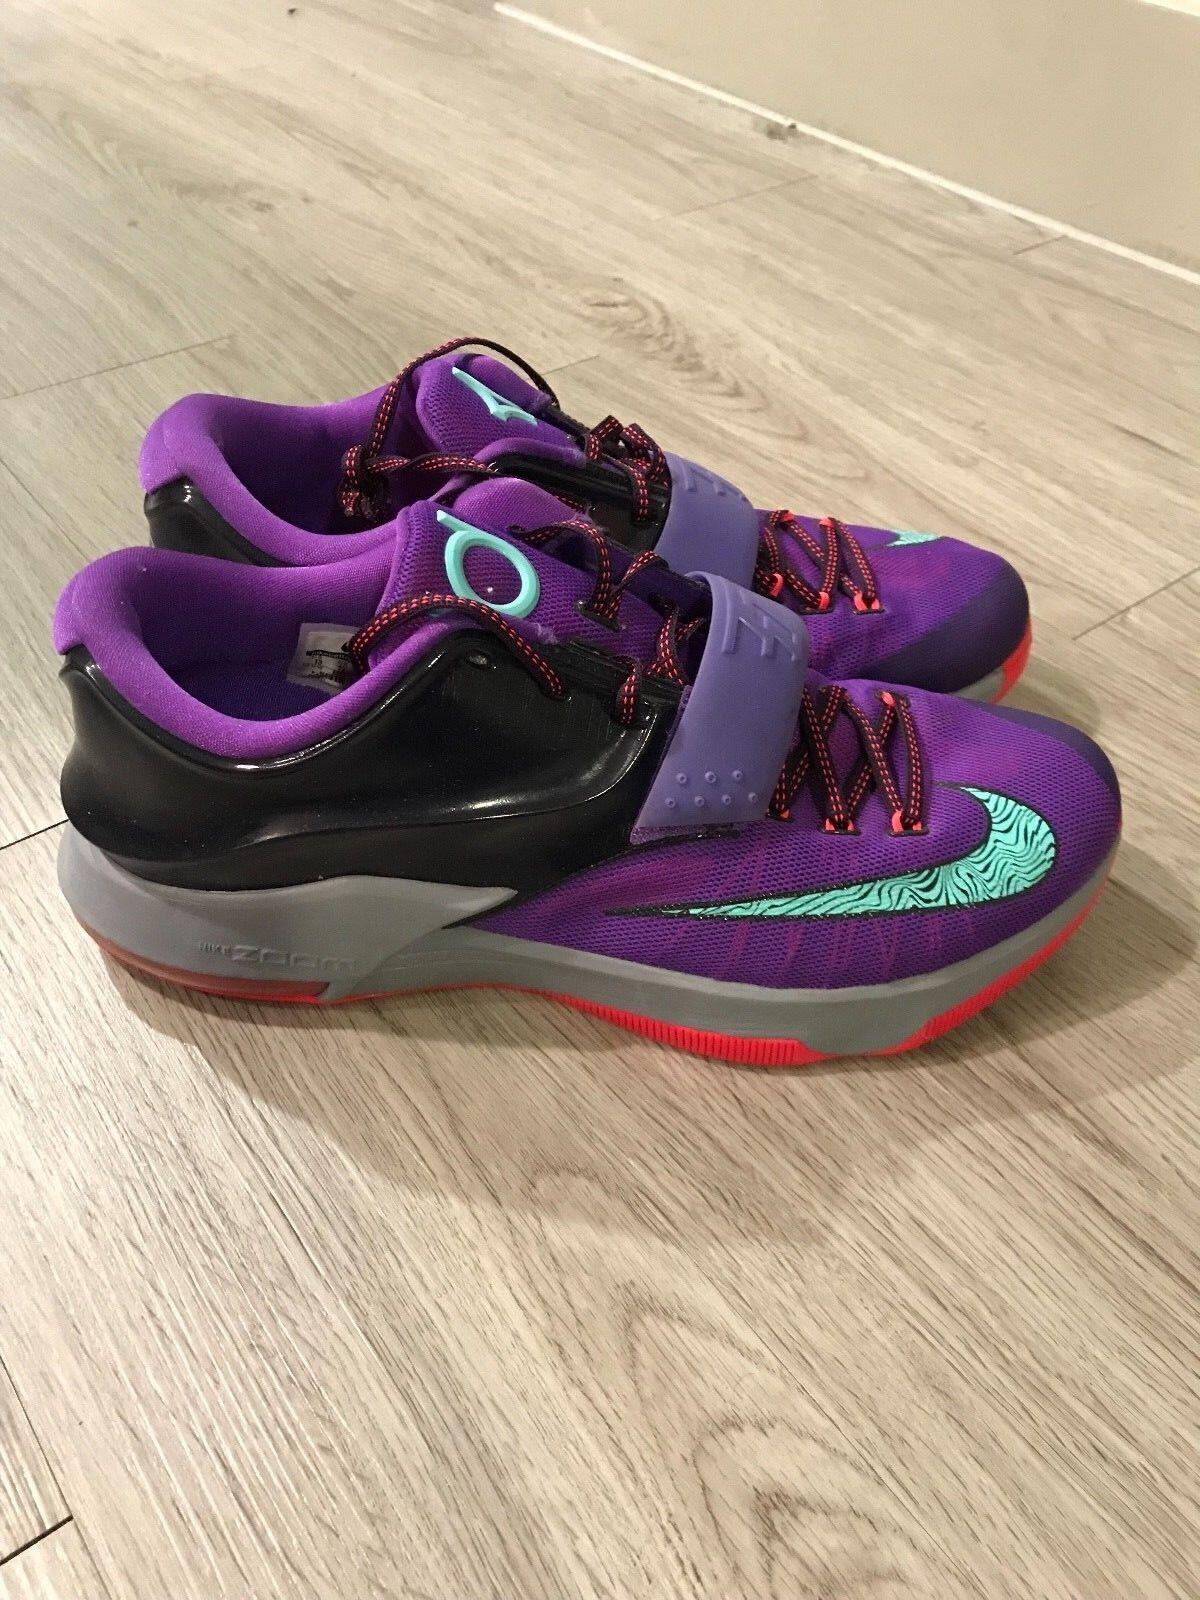 Men's Nike KD 7 Cave Purple Size 13